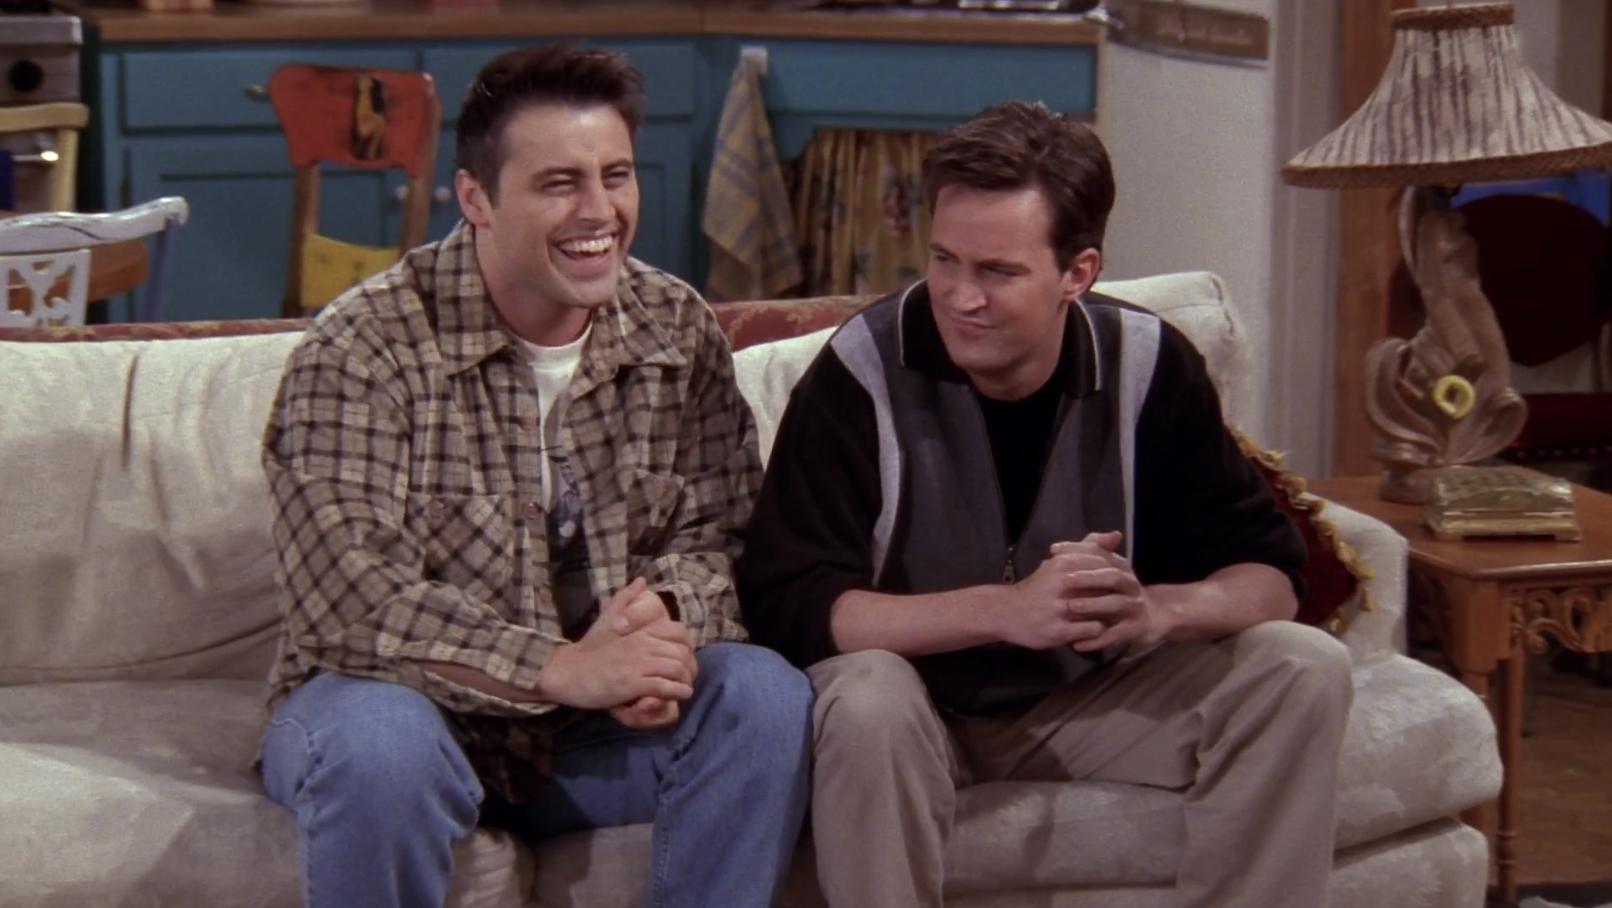 Joey giggles.